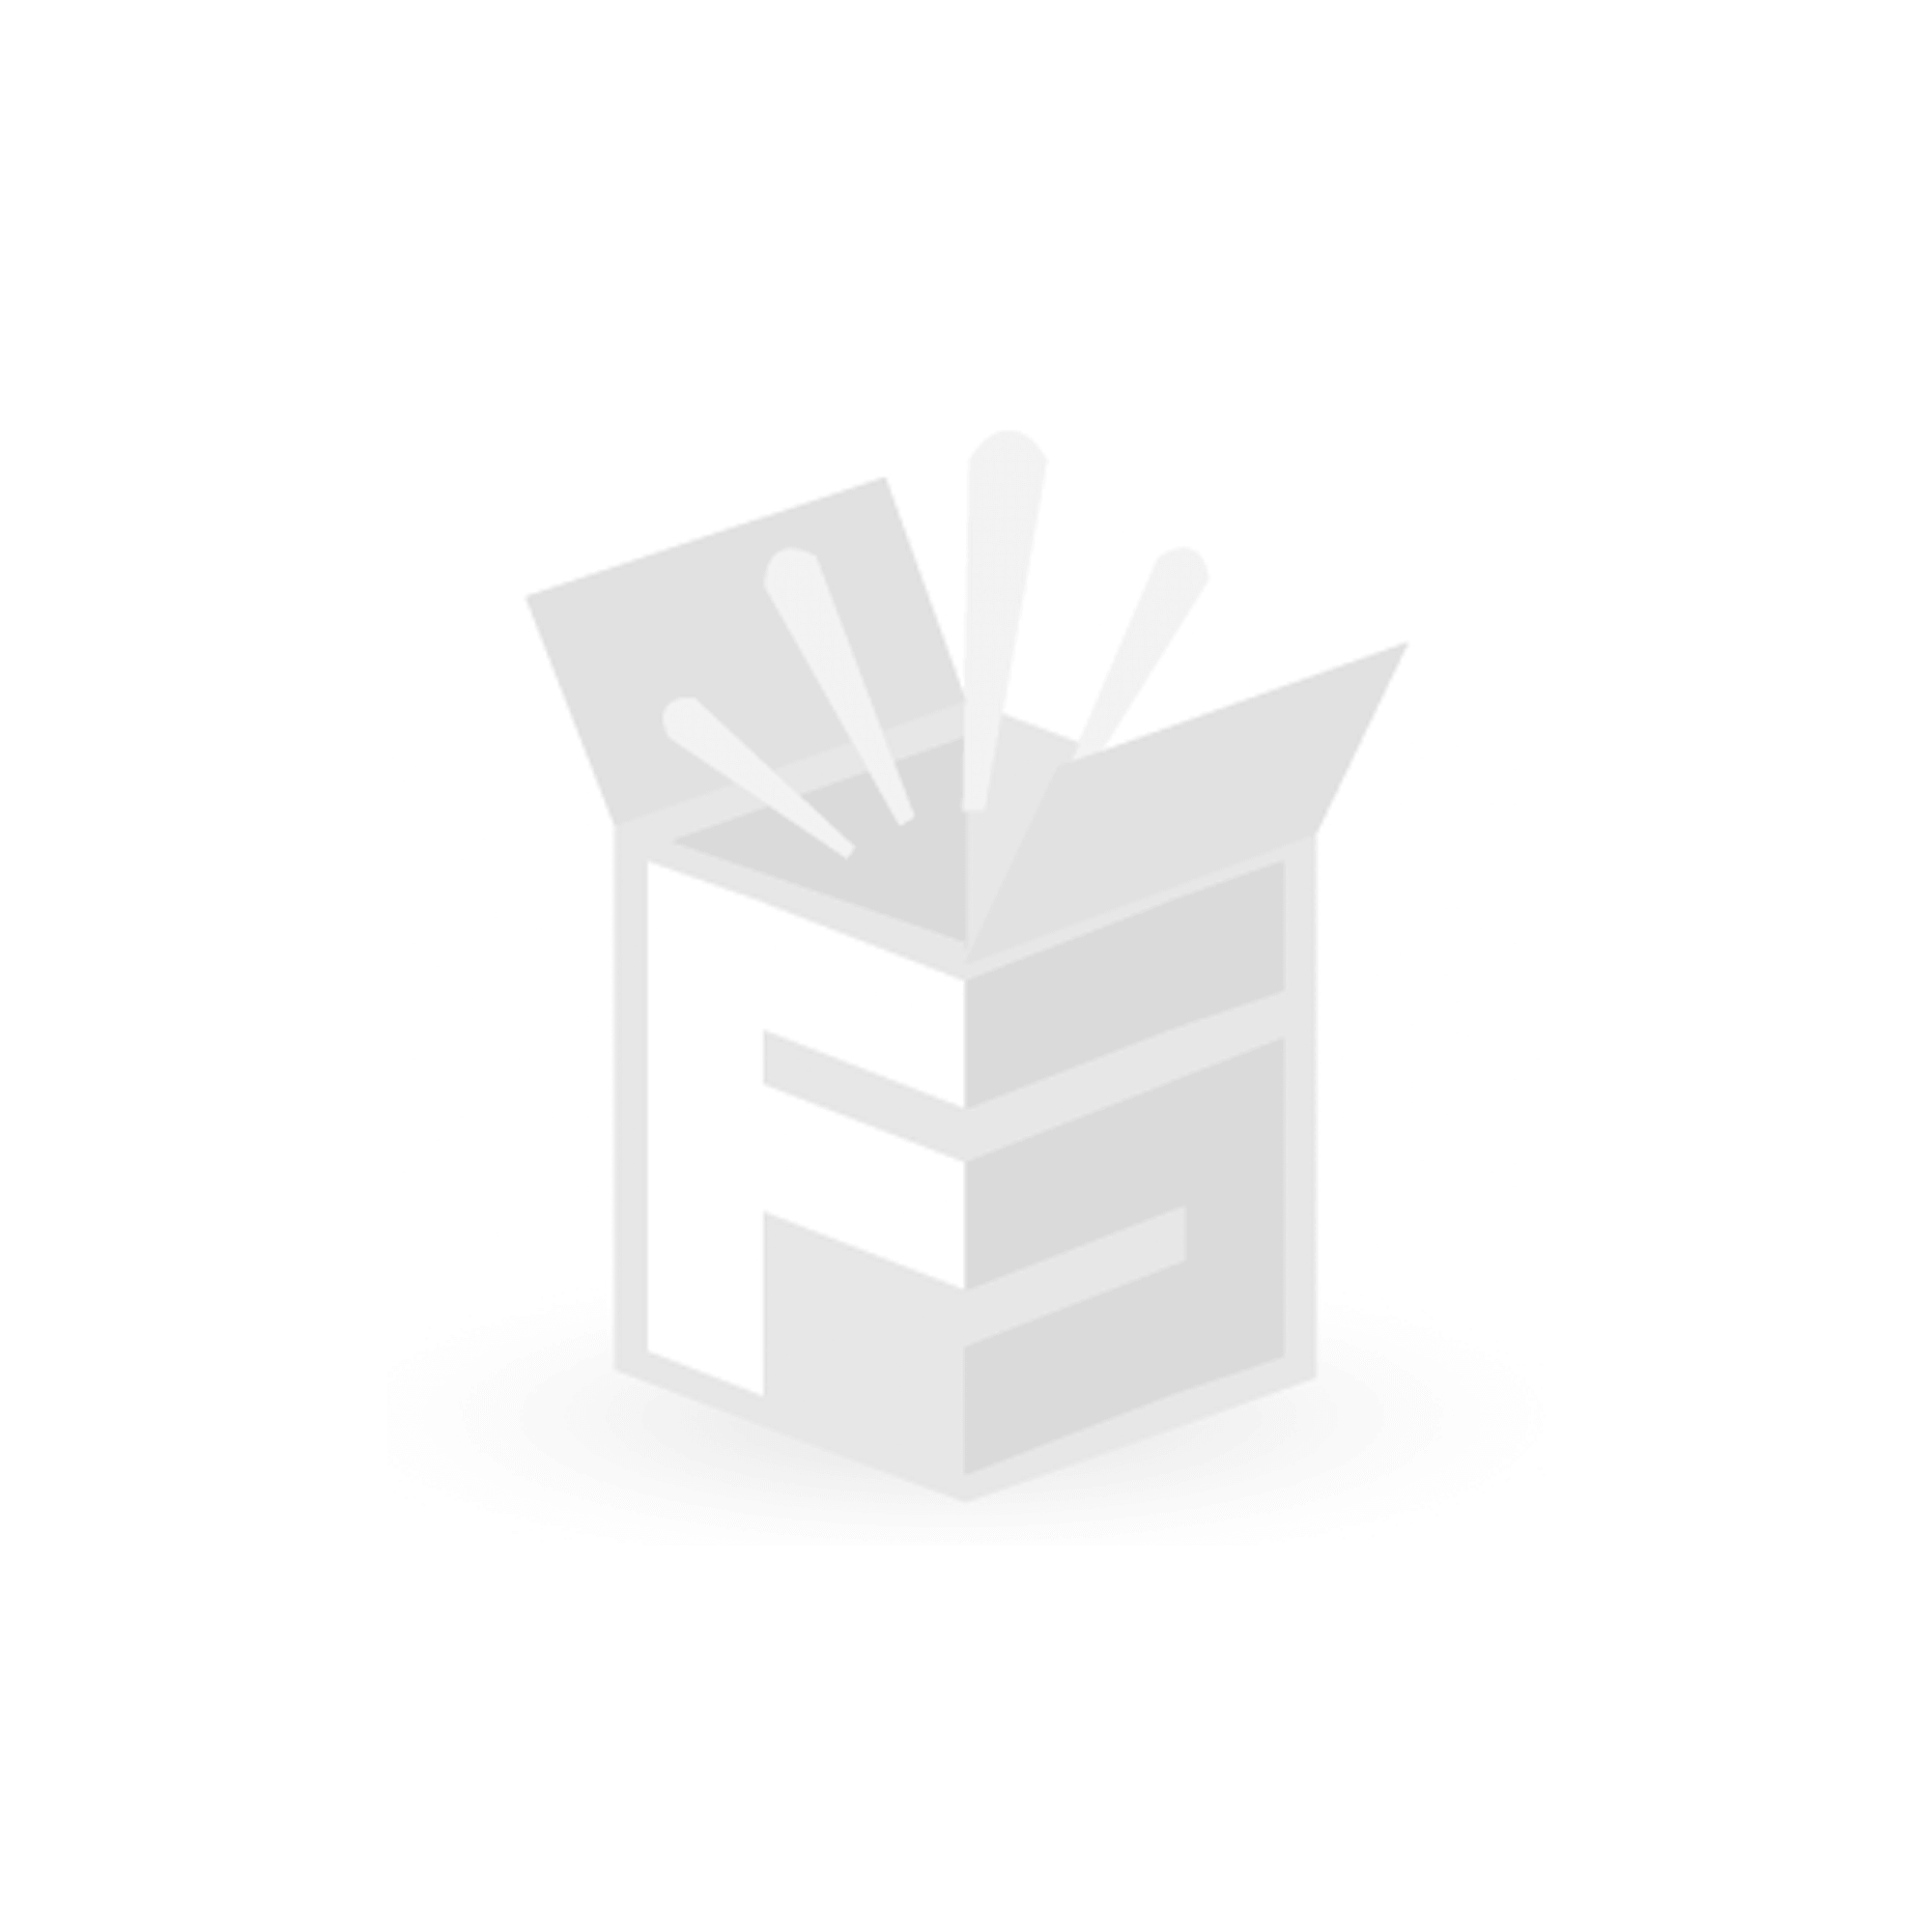 Contini höhenverstellbarer Bürotisch 200 x 90 cm, grau / Gestell dunkelgrau